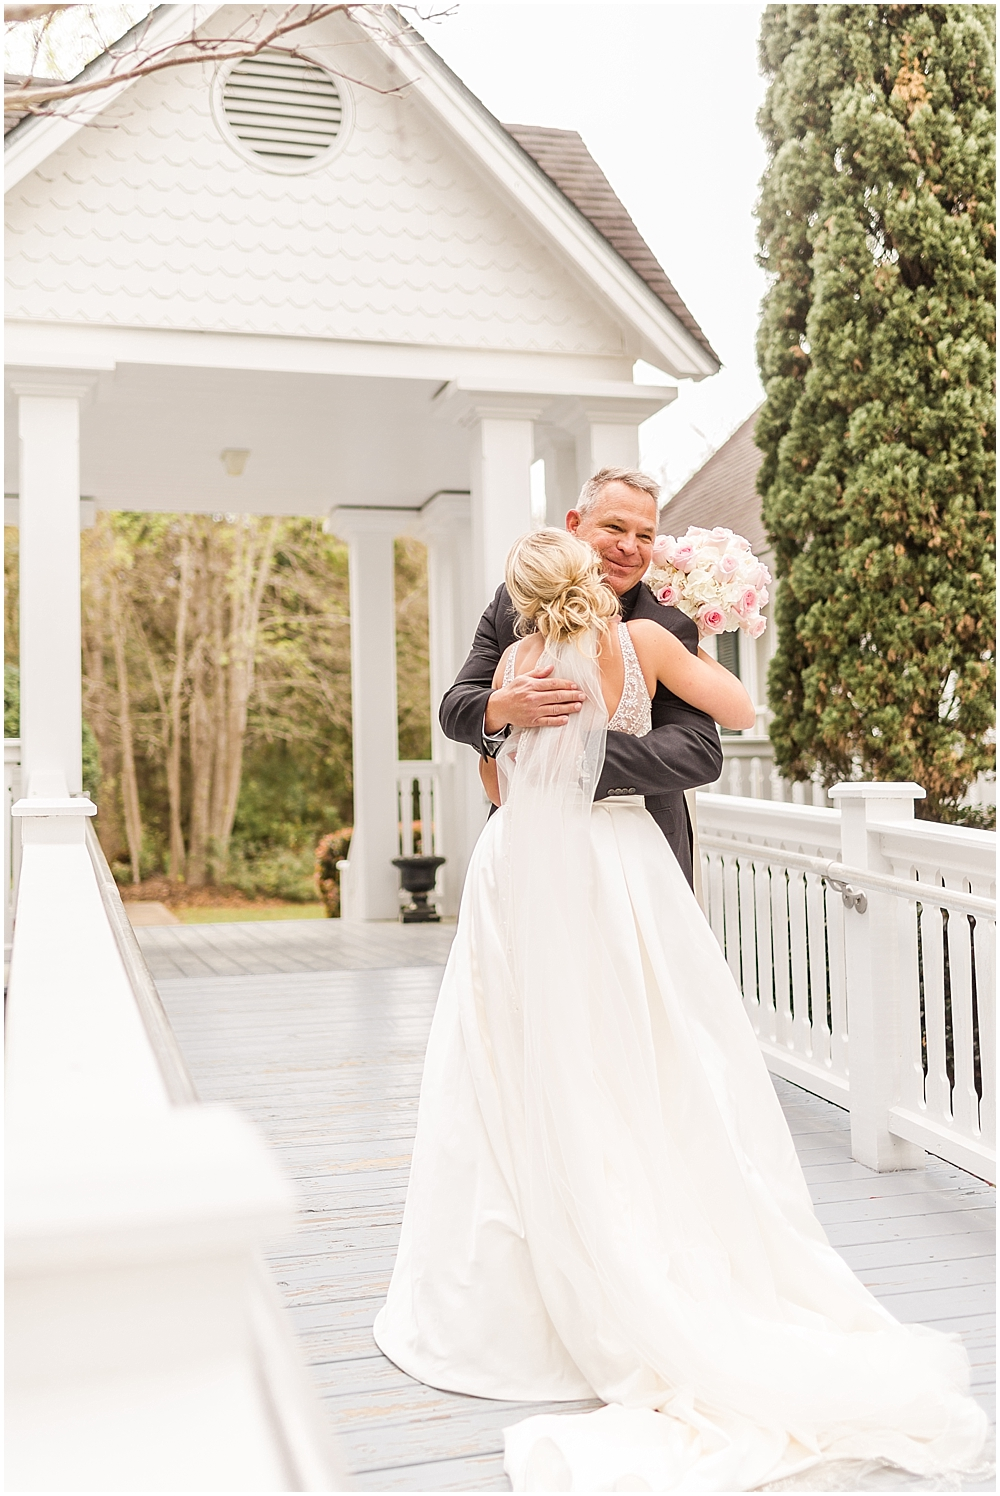 Ashton-Clark-Photography-Wedding-Portrait-Family-Photographer-Mobile-Alabama_0308.jpg